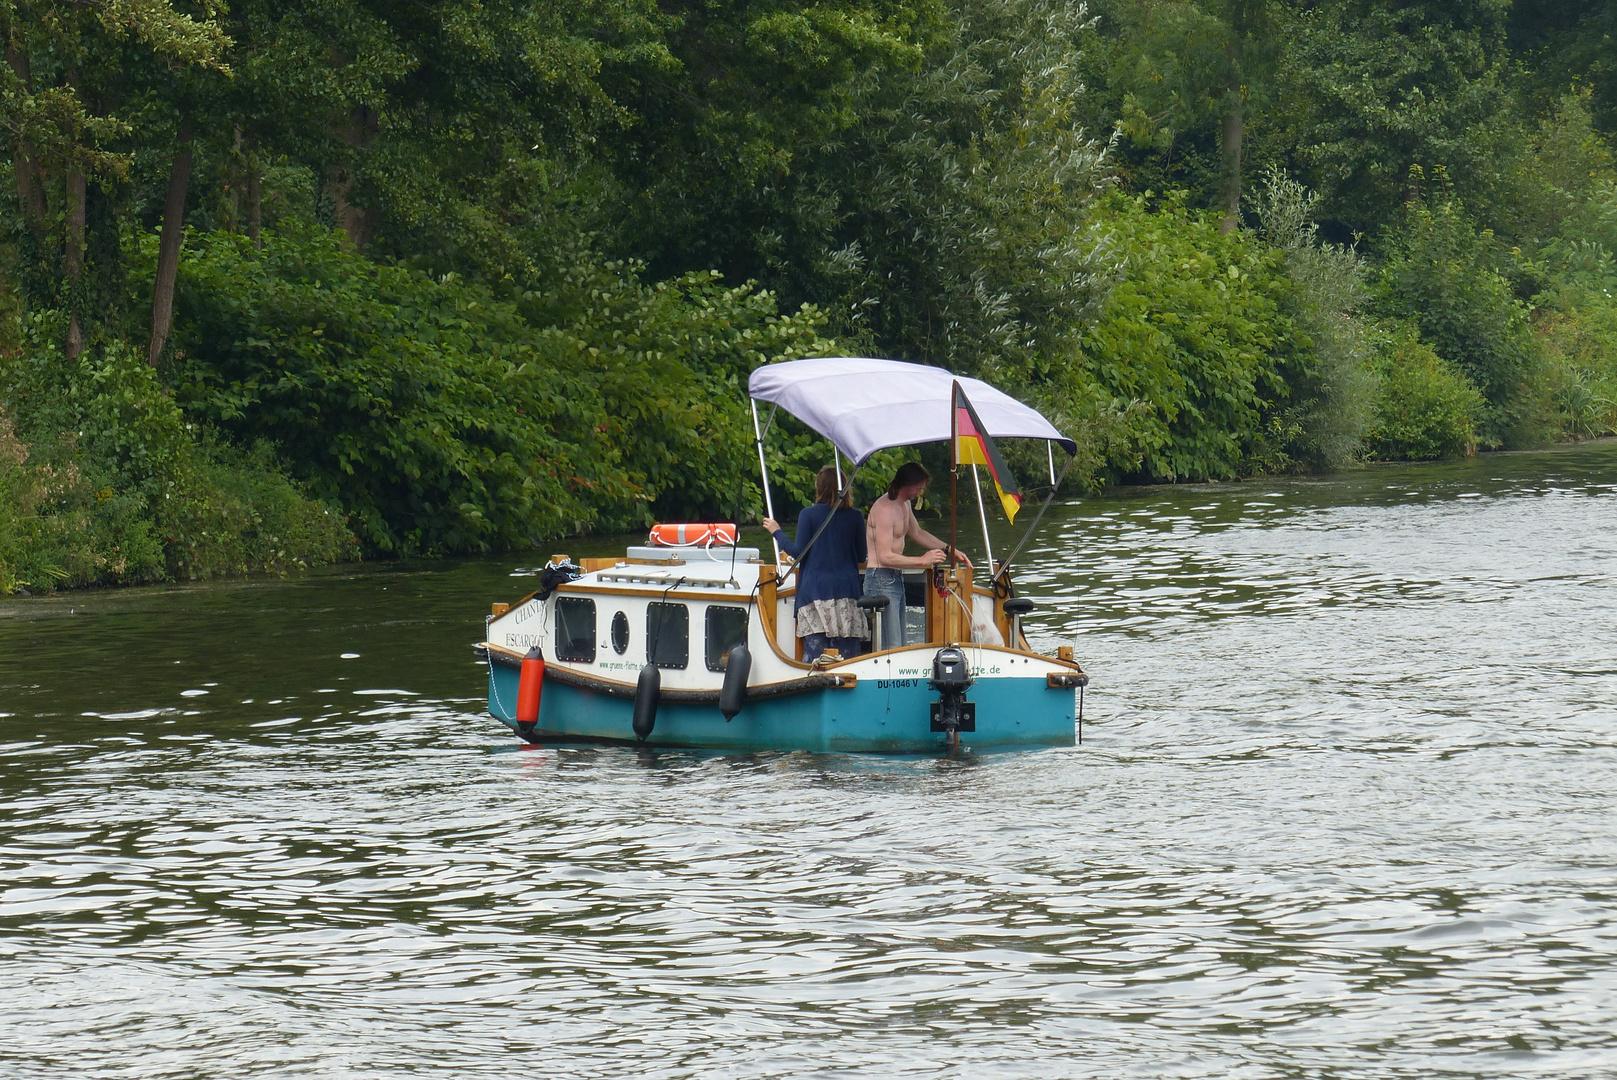 Trethausboot Ruhr